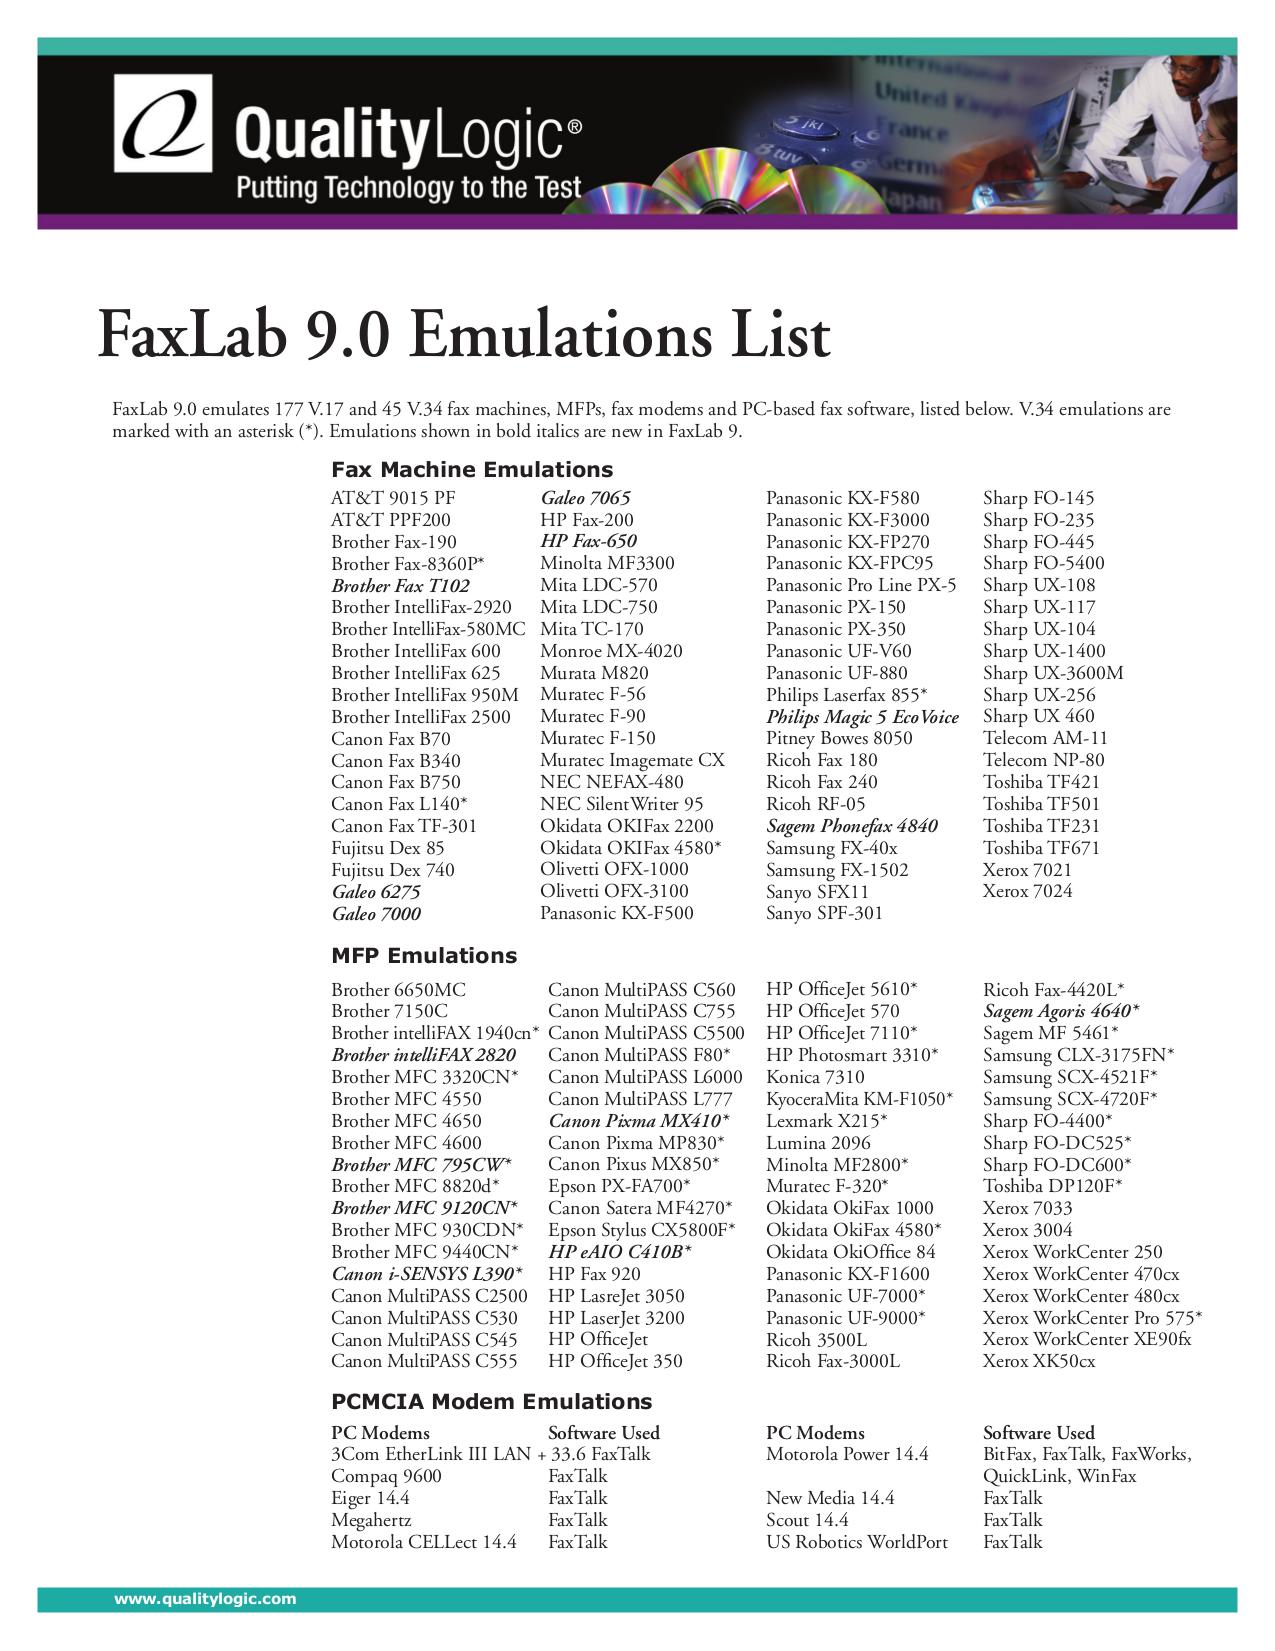 Download free pdf for Panasonic KX-F150 Fax Machine manual